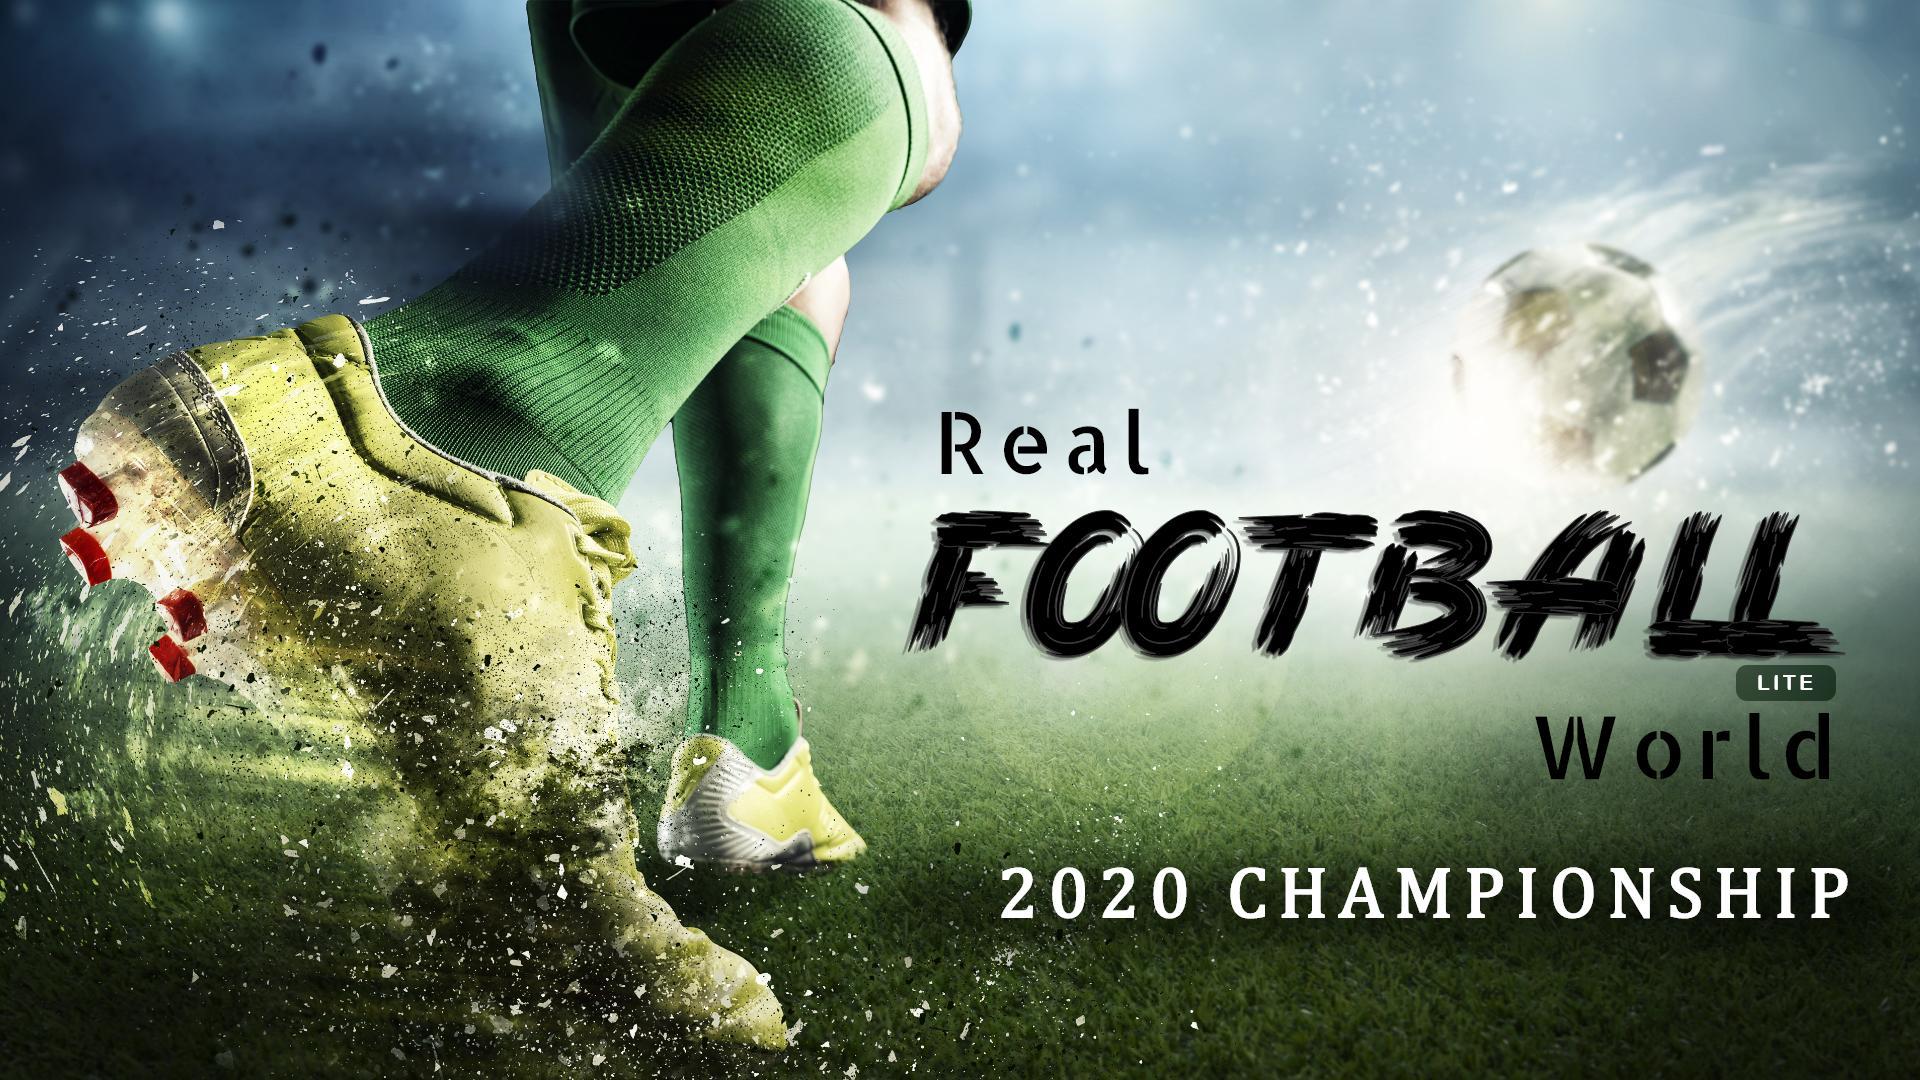 Real Football World Lite : 2020 Championship 1.6 Screenshot 1